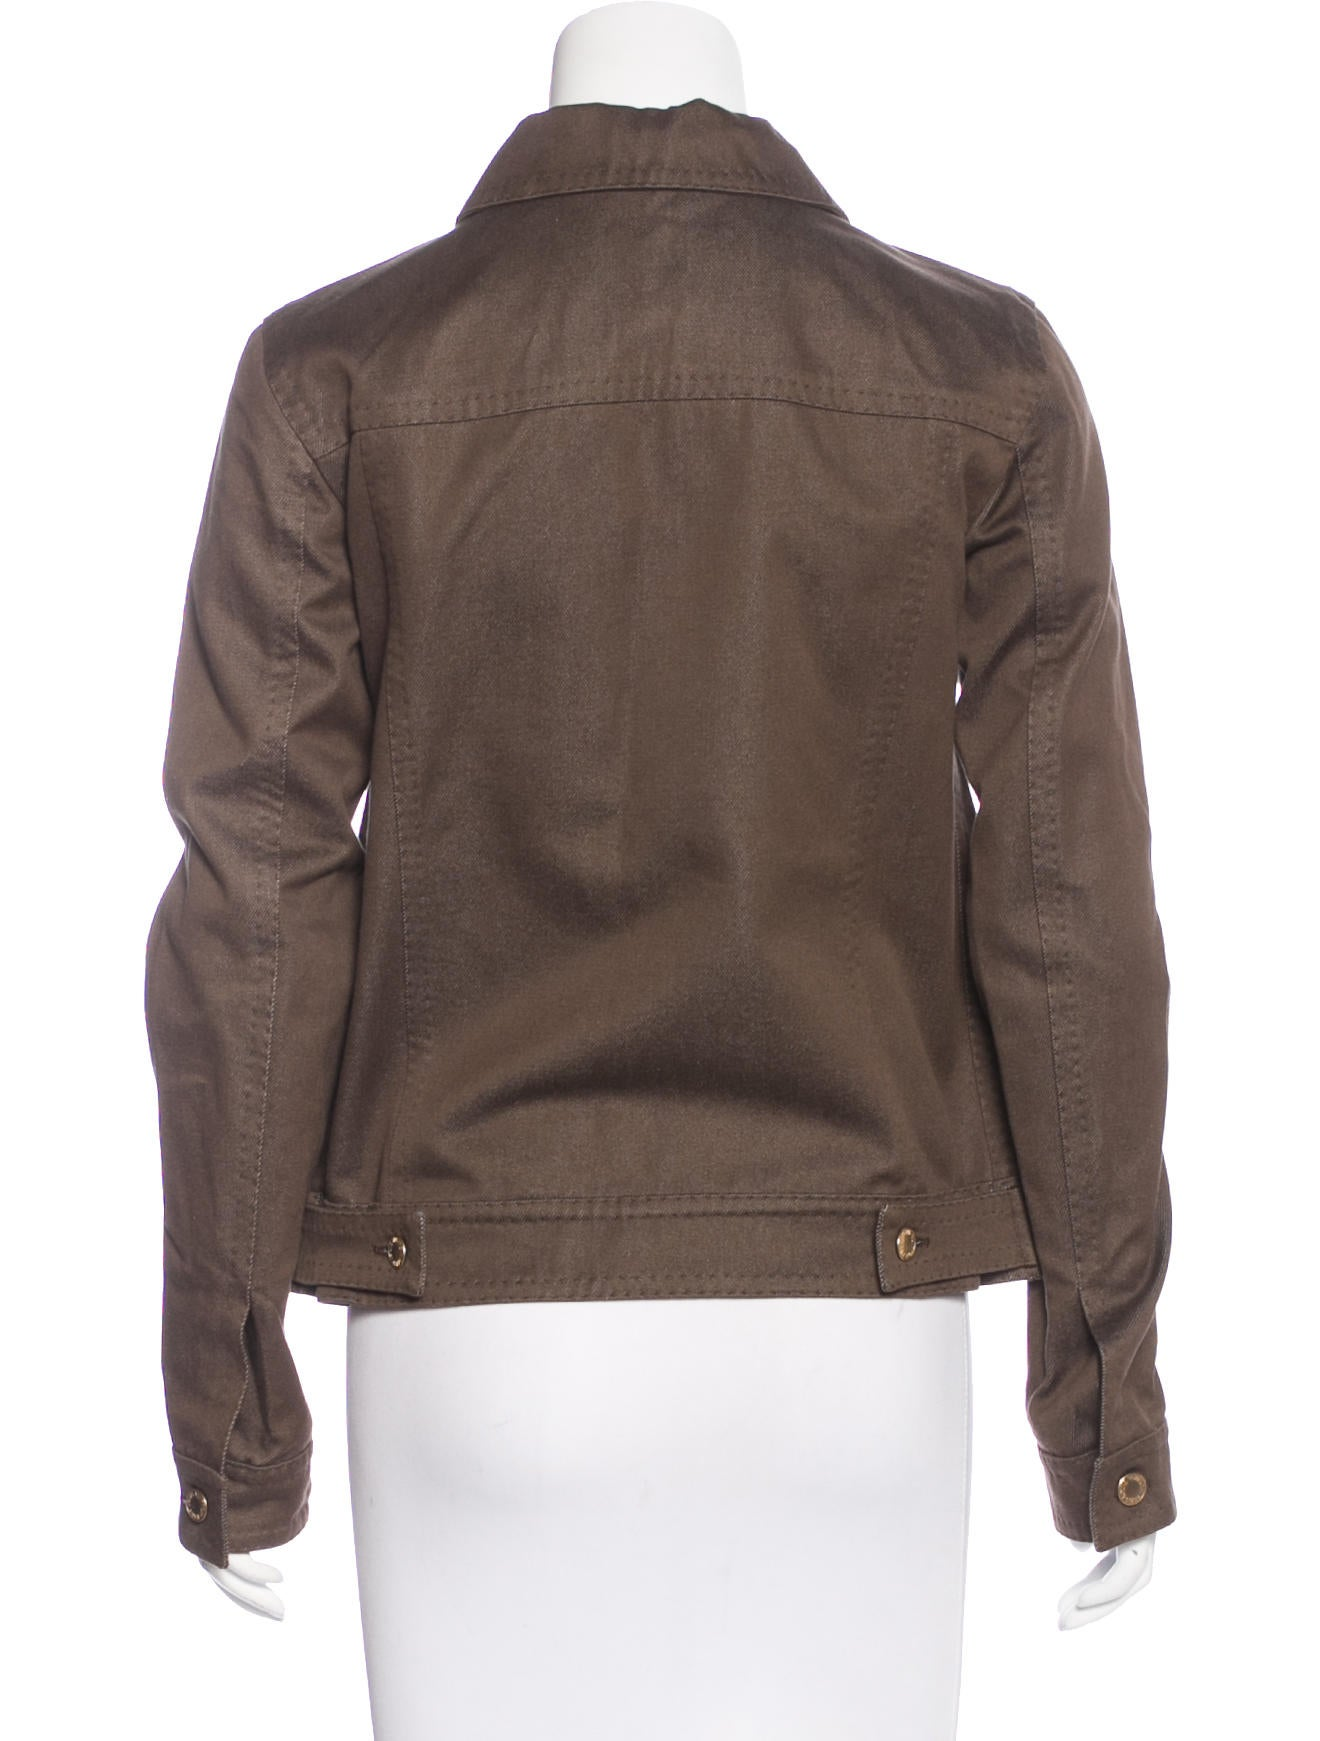 louis vuitton long sleeve denim jacket clothing. Black Bedroom Furniture Sets. Home Design Ideas